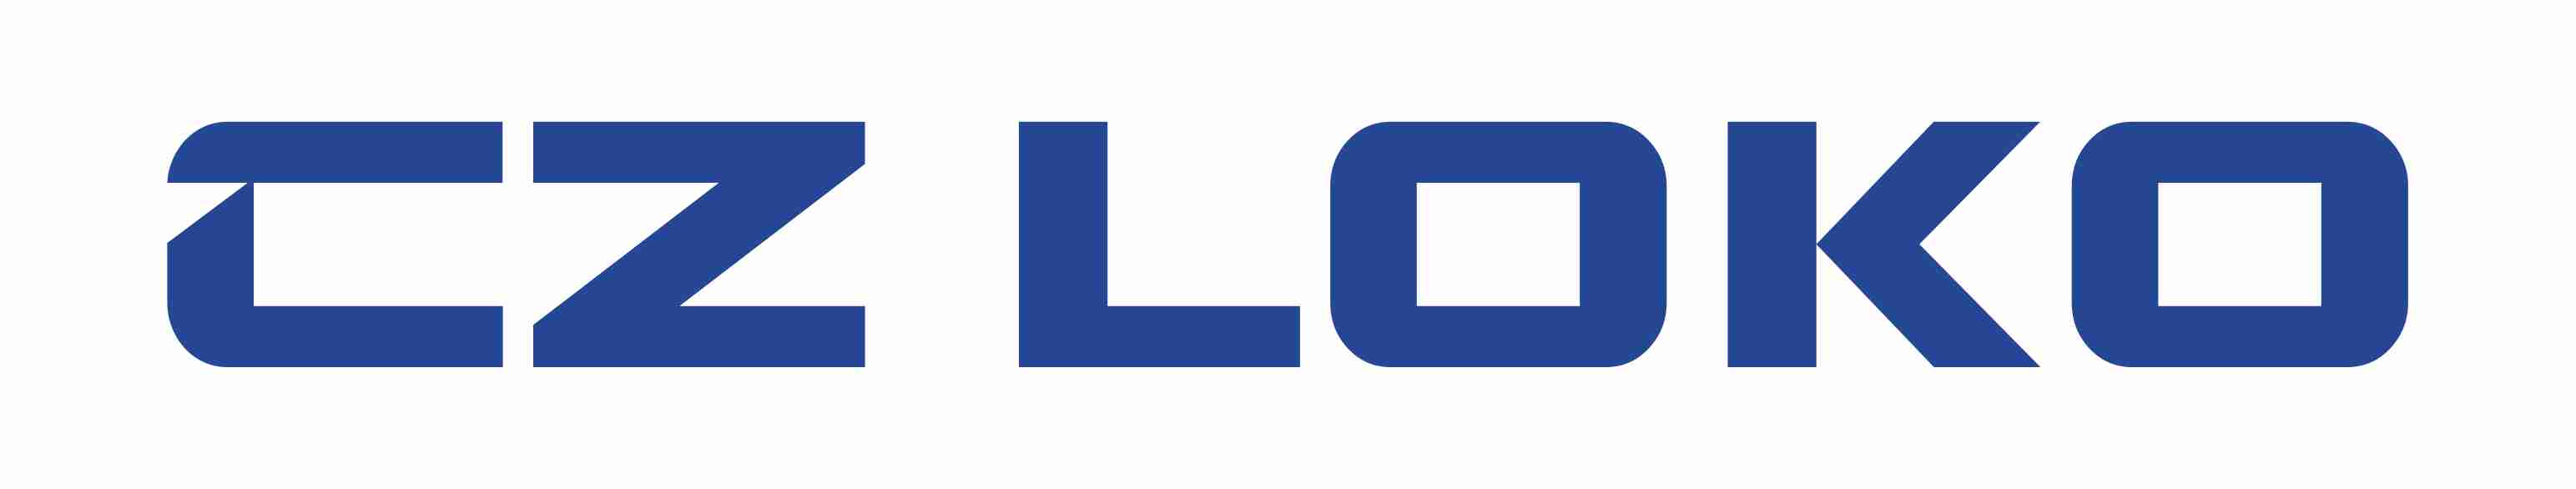 CZ LOKO_logo